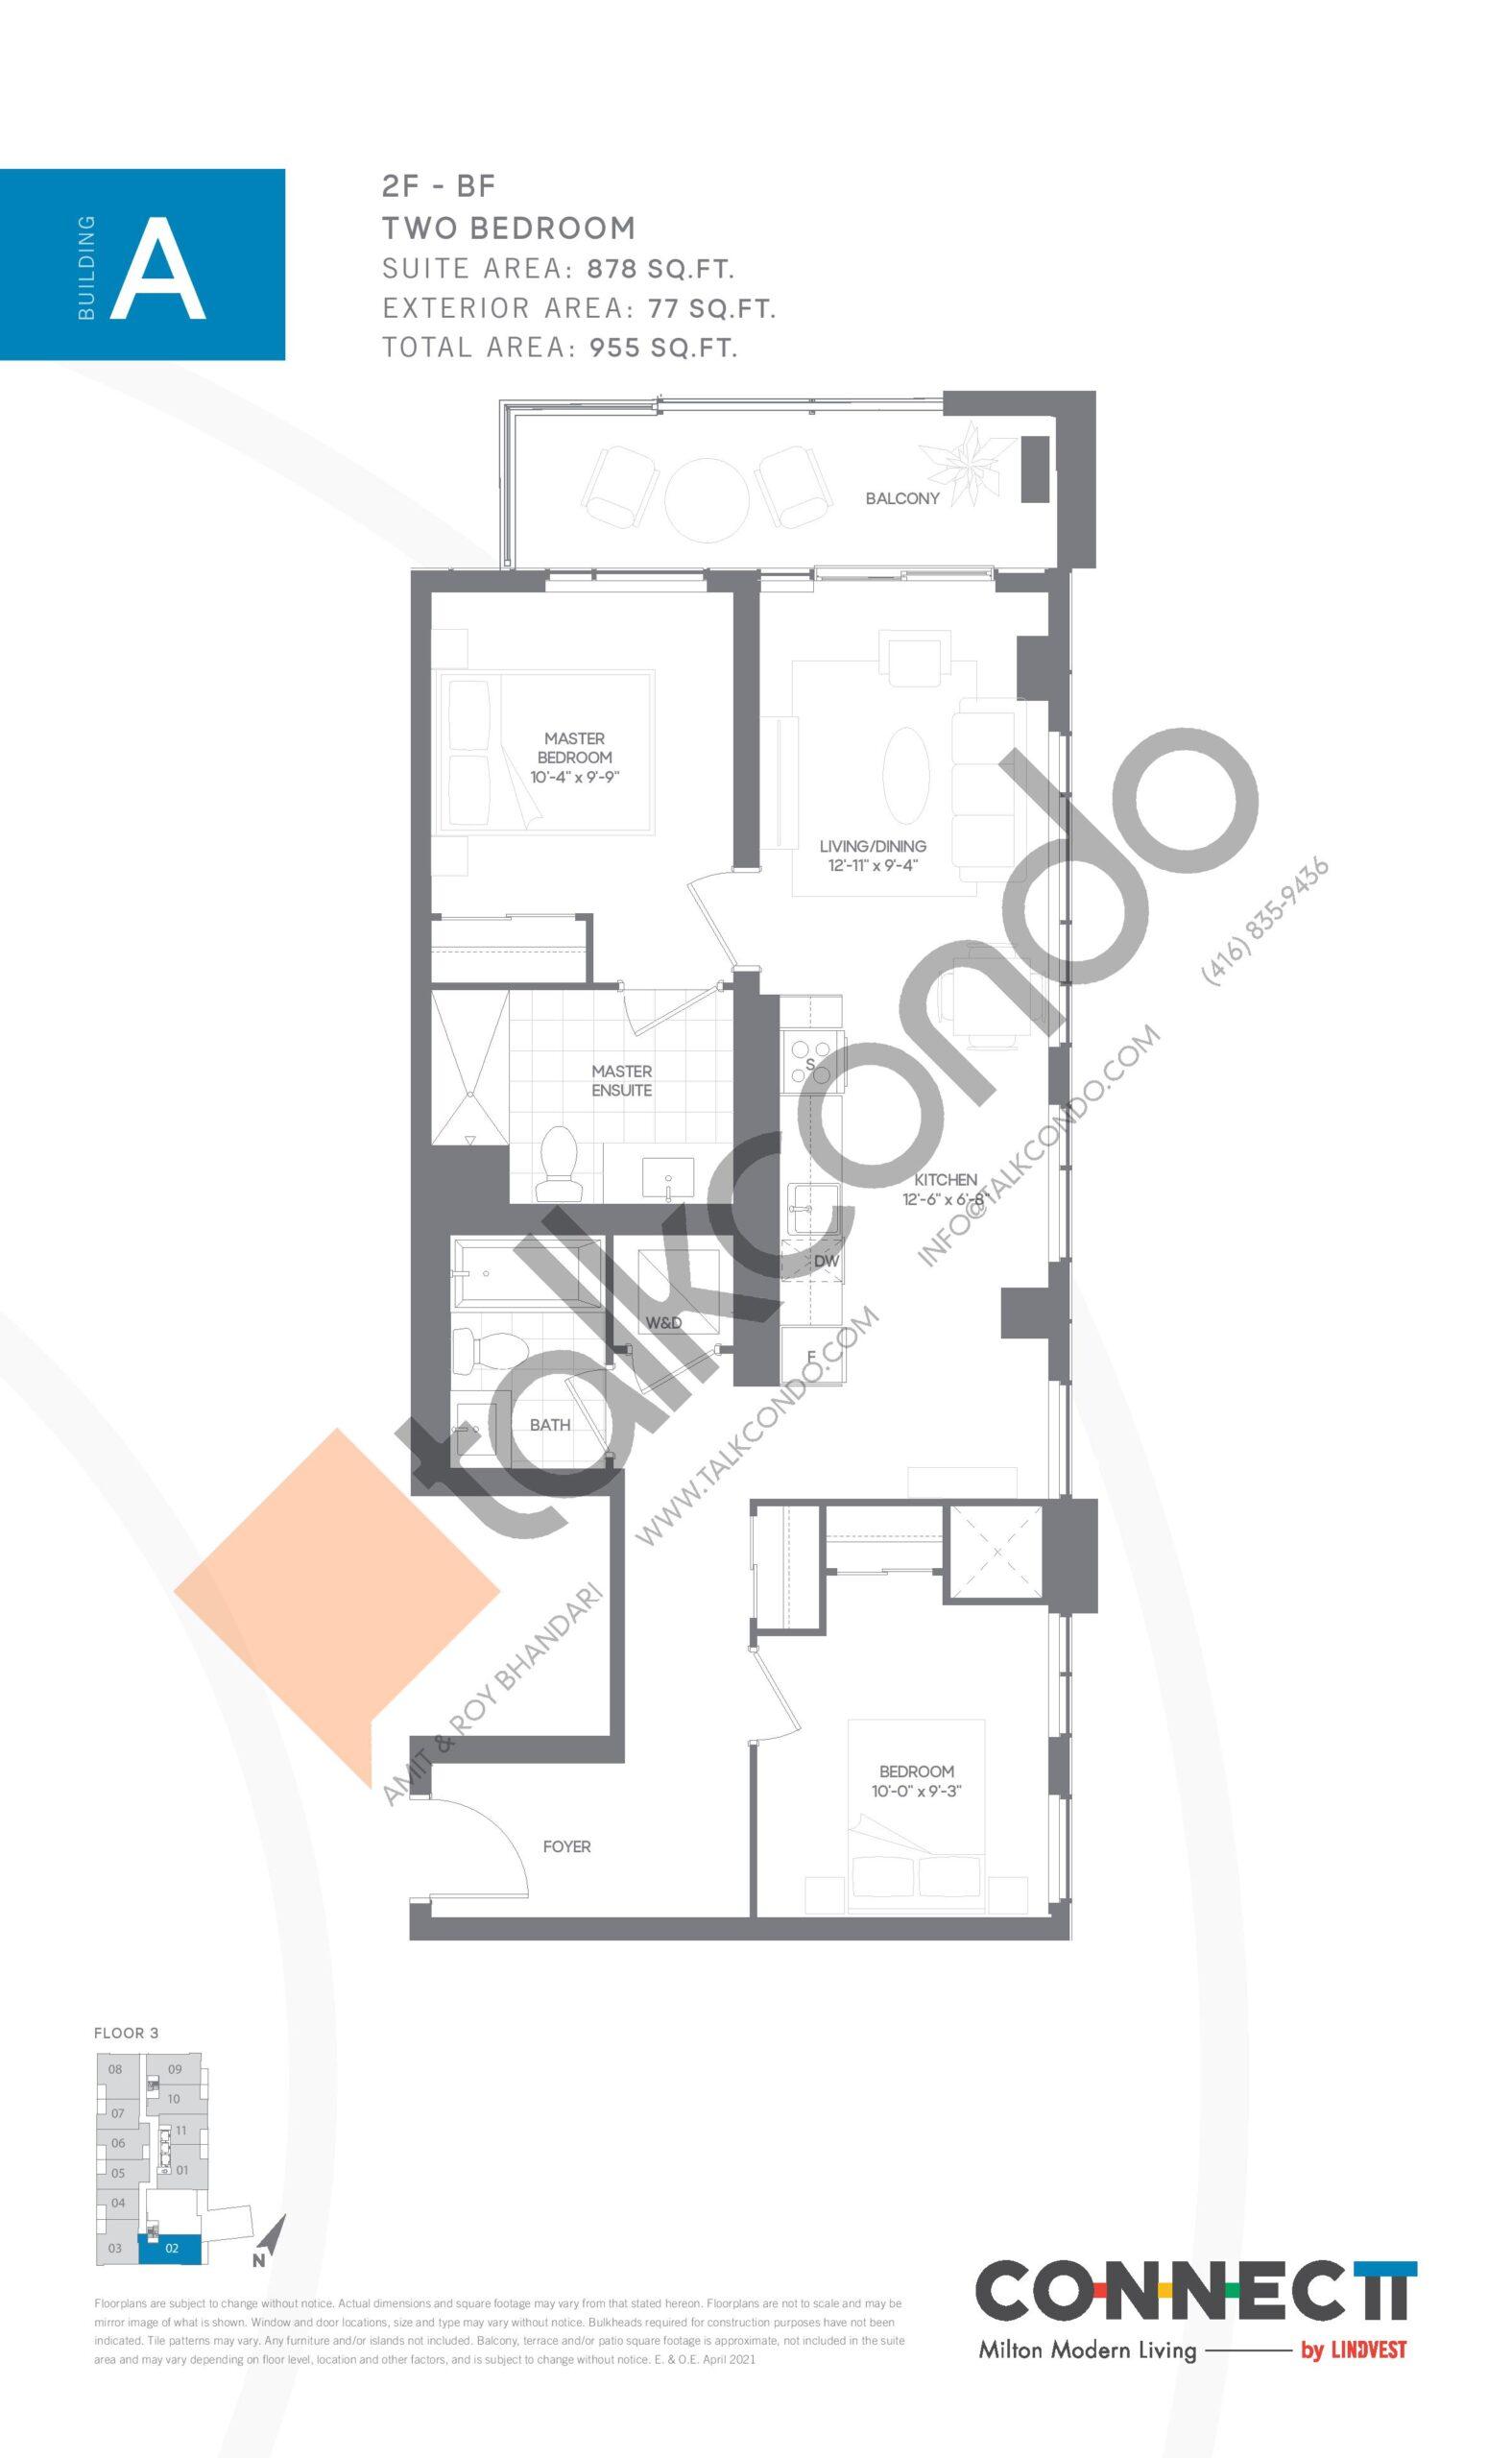 2F - BF Floor Plan at Connectt Urban Community Condos - 878 sq.ft